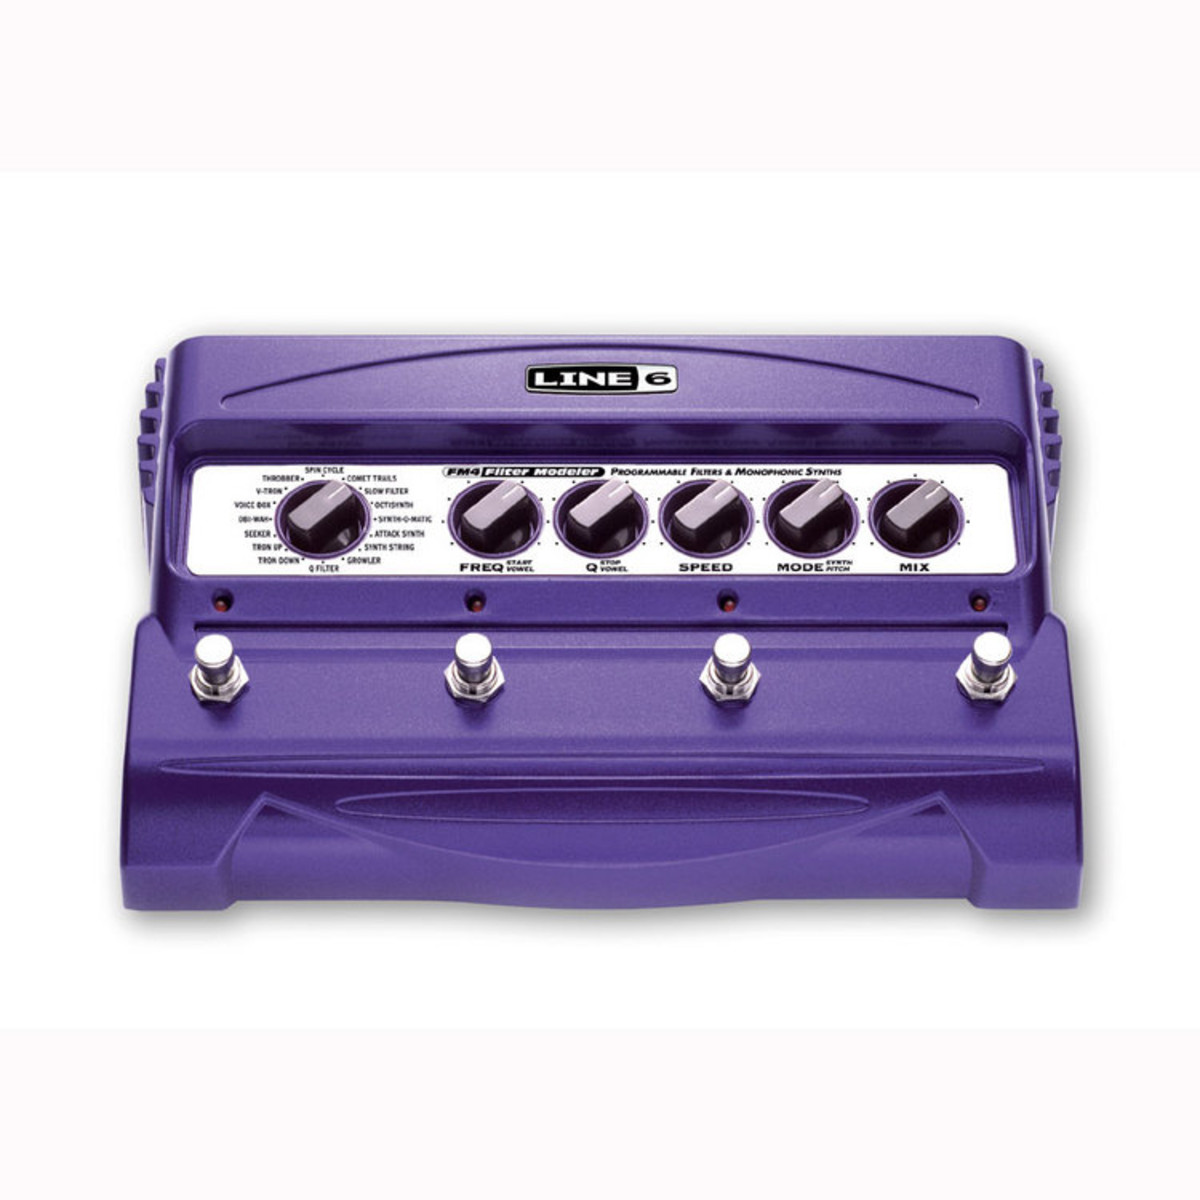 Line 6 FM4 Stompbox Modeler Filter Effects Pedal 1